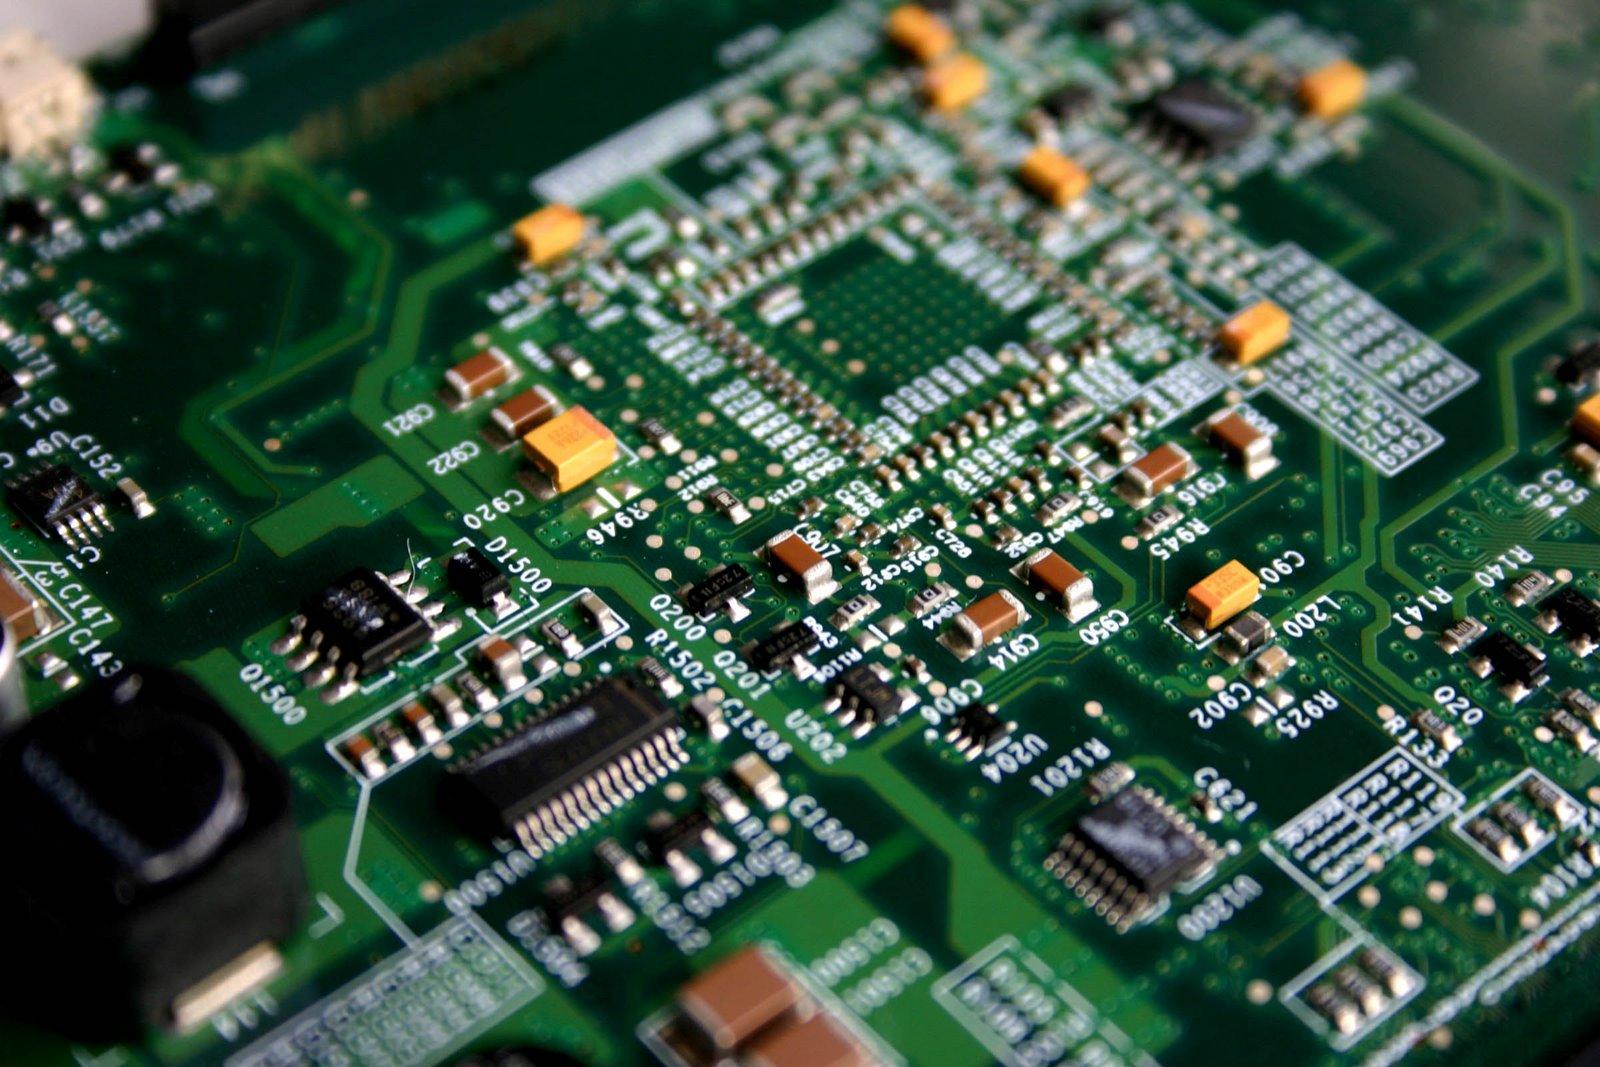 Manutenzione apparati elettronici